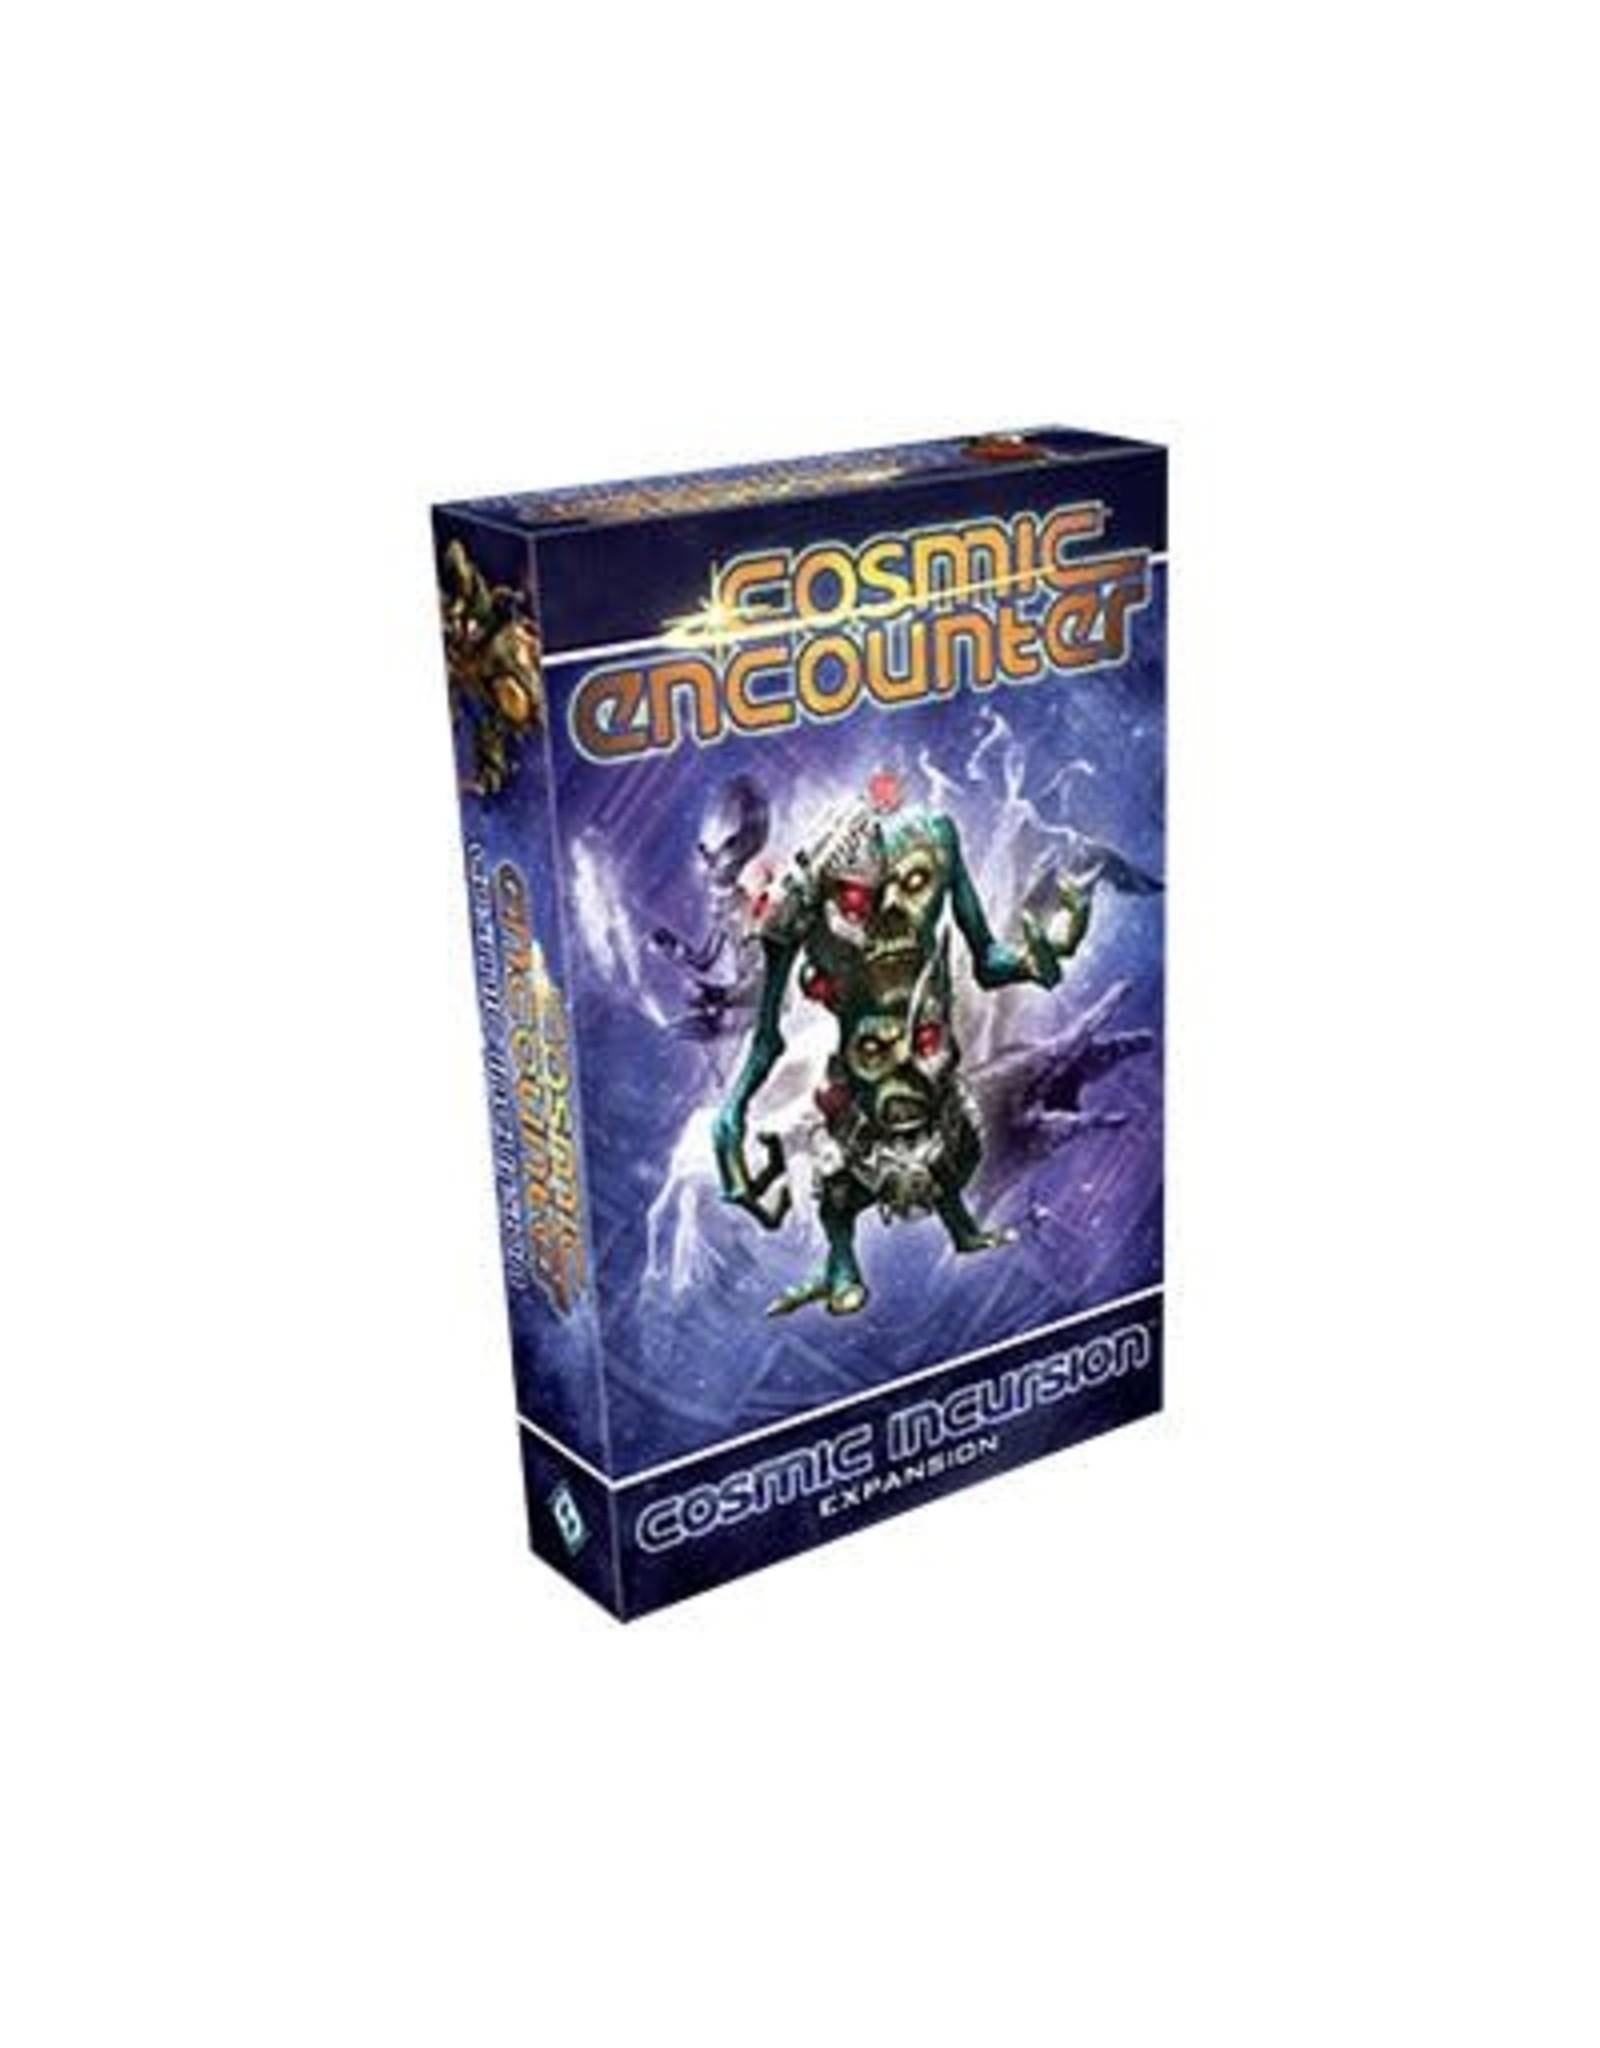 Fantasy Flight Cosmic Encounters Expansion - Cosmic Incursion